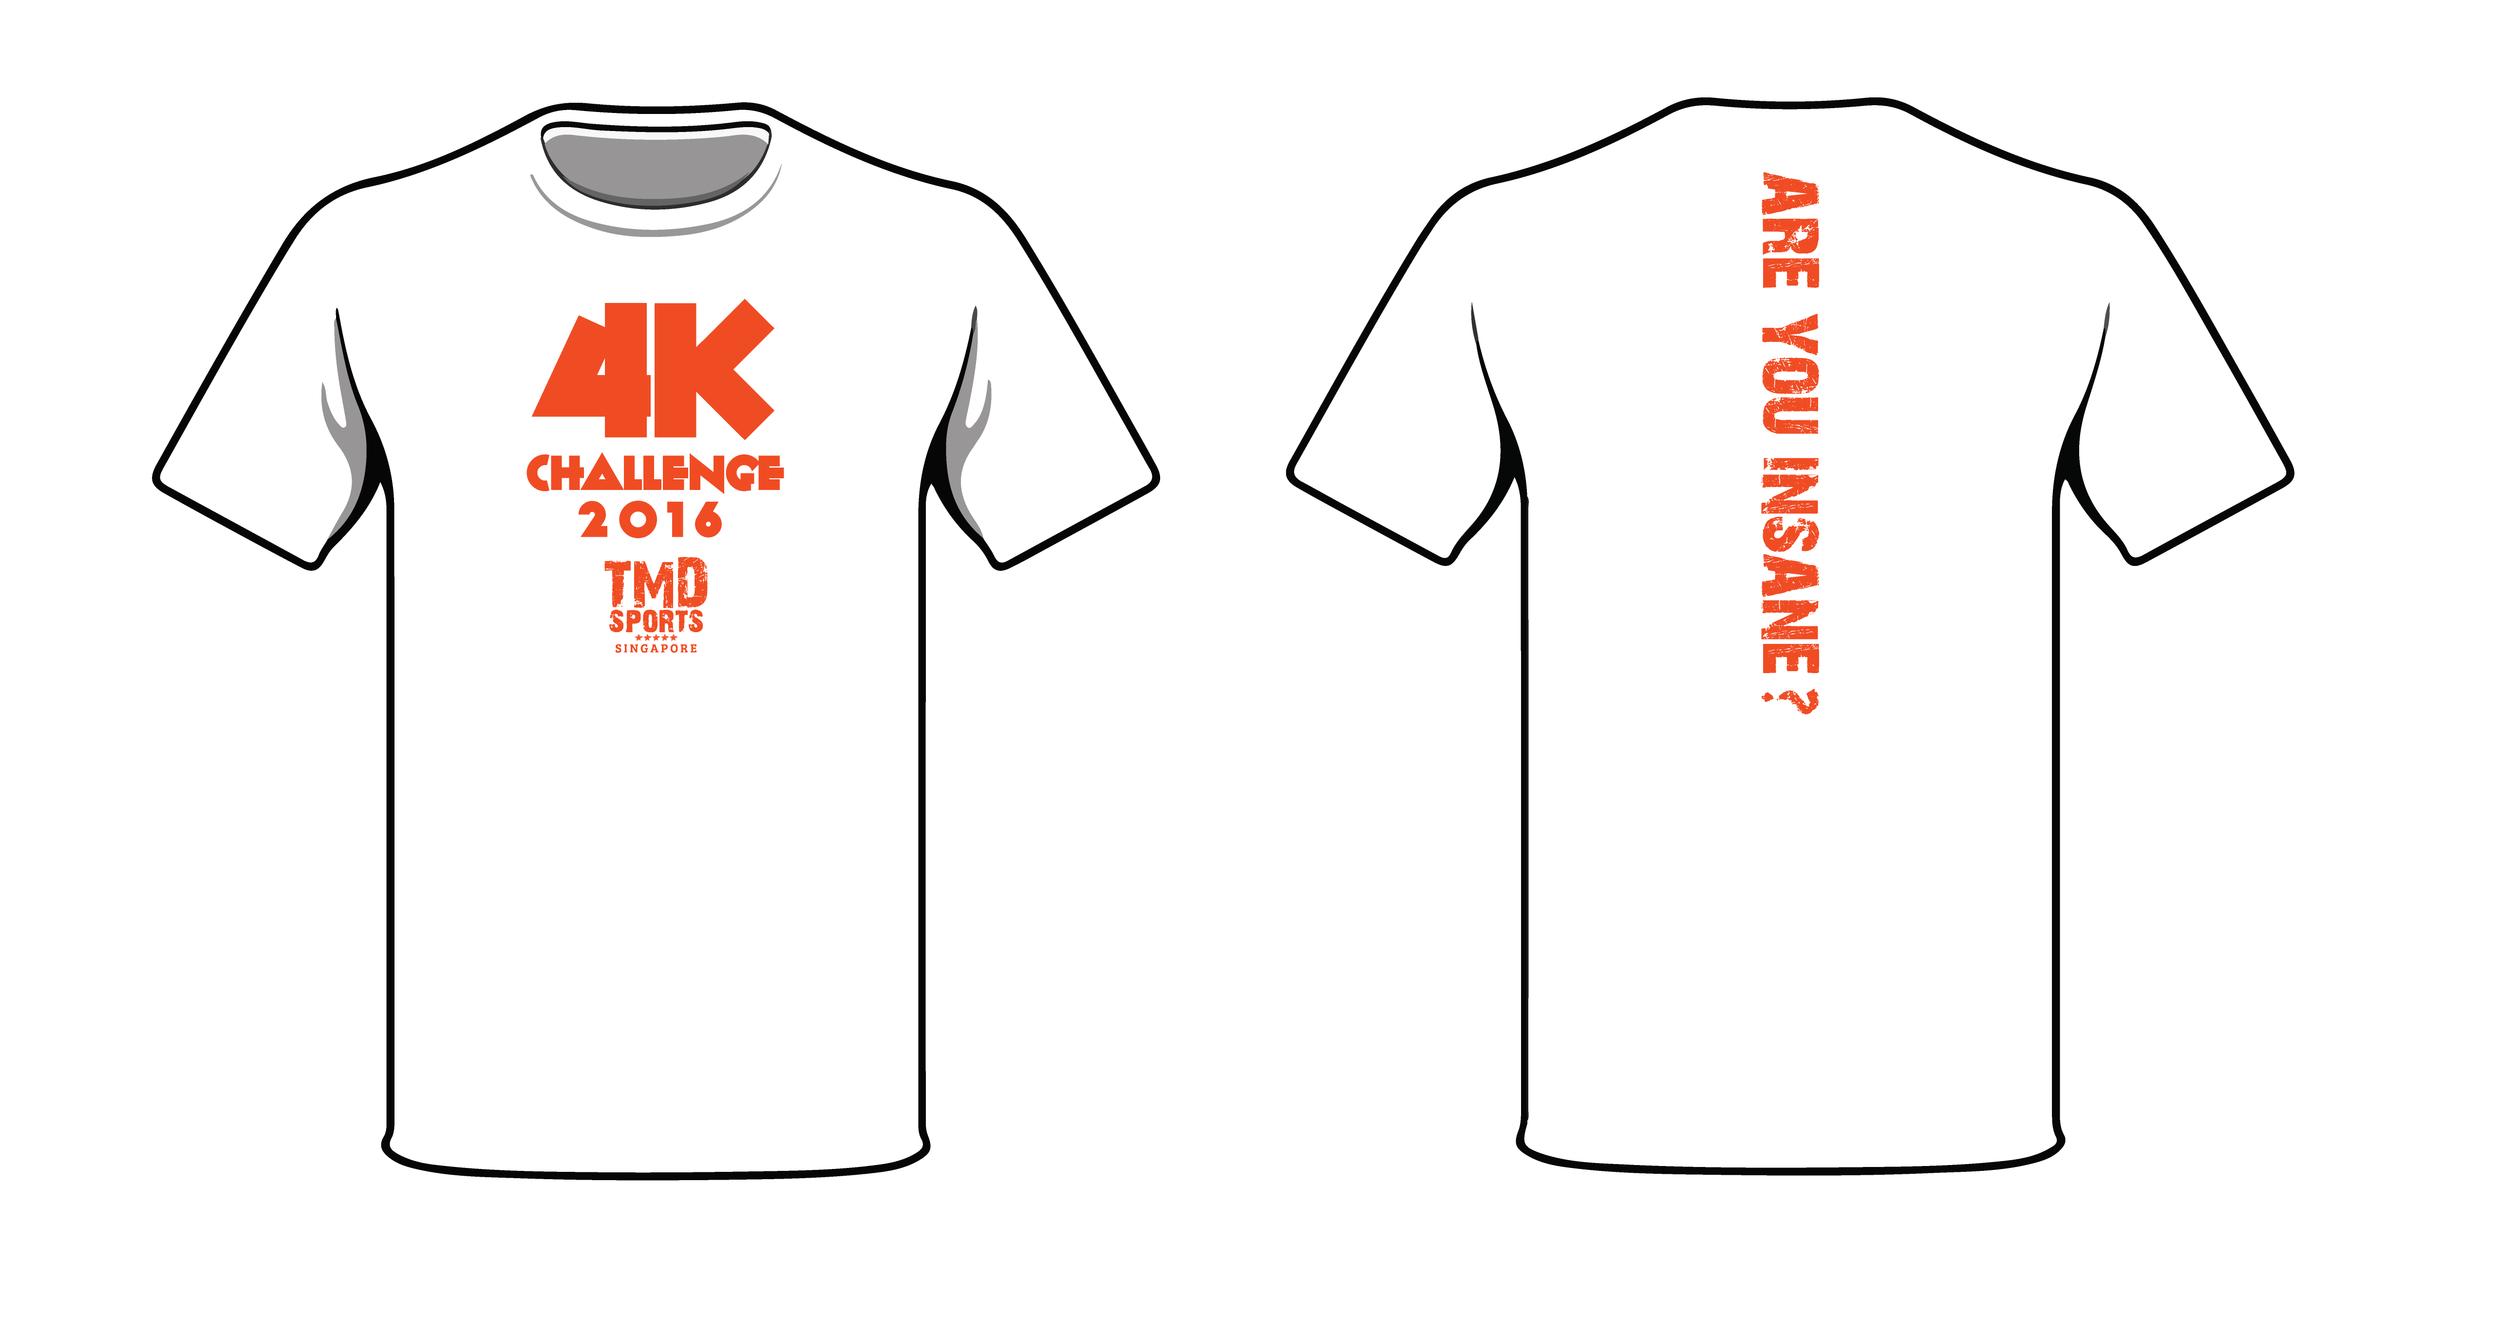 4K Challenge Shirt